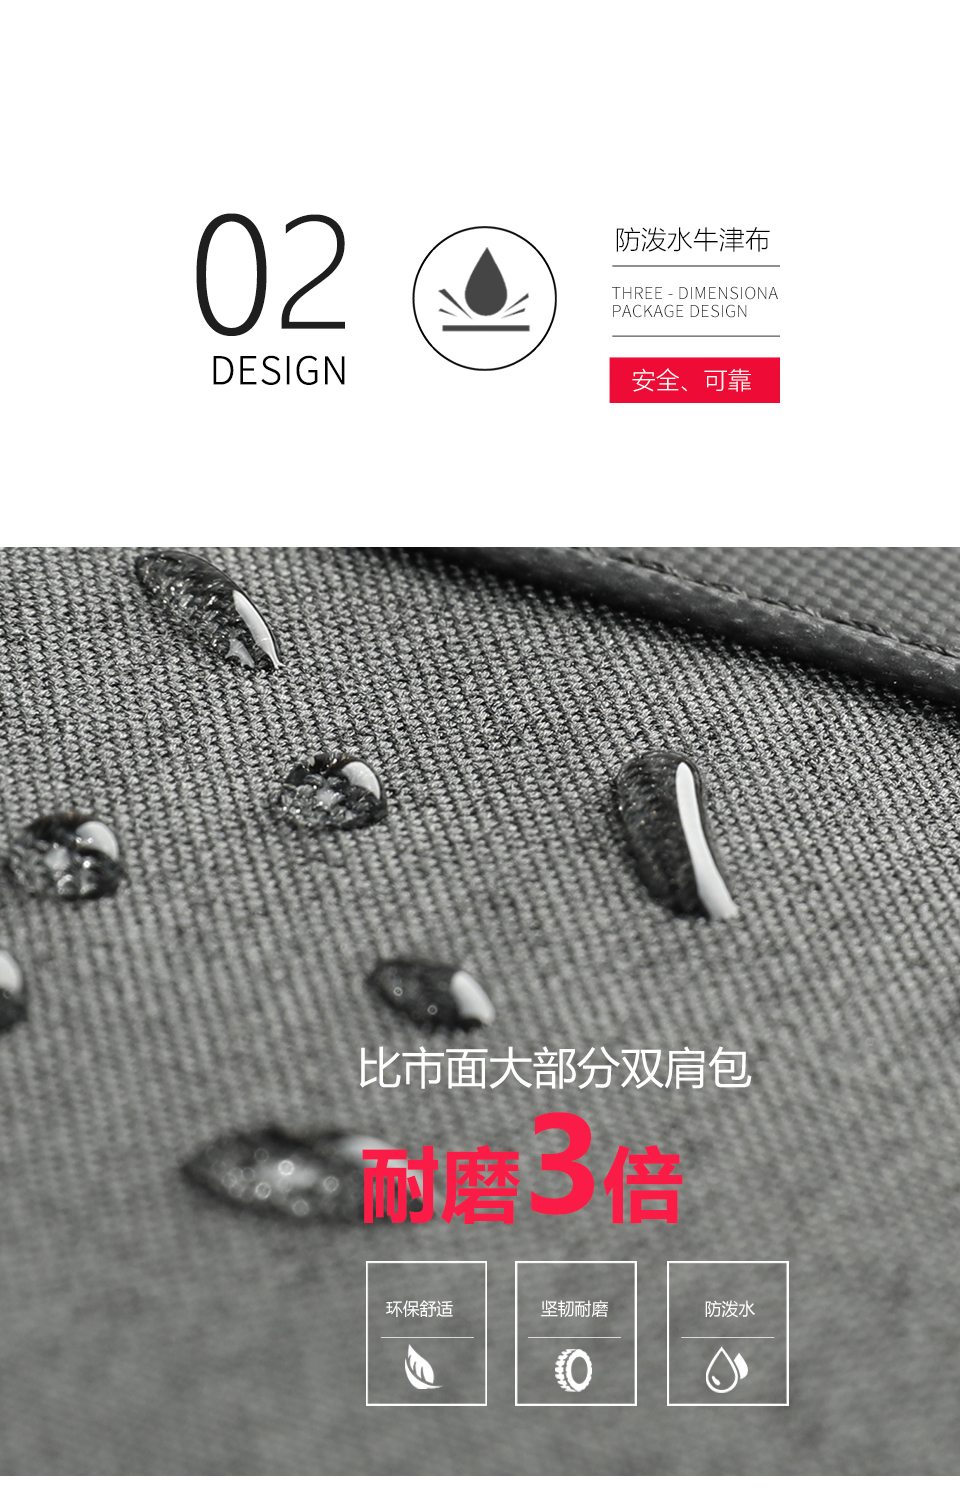 T-B3595中文_10.jpg